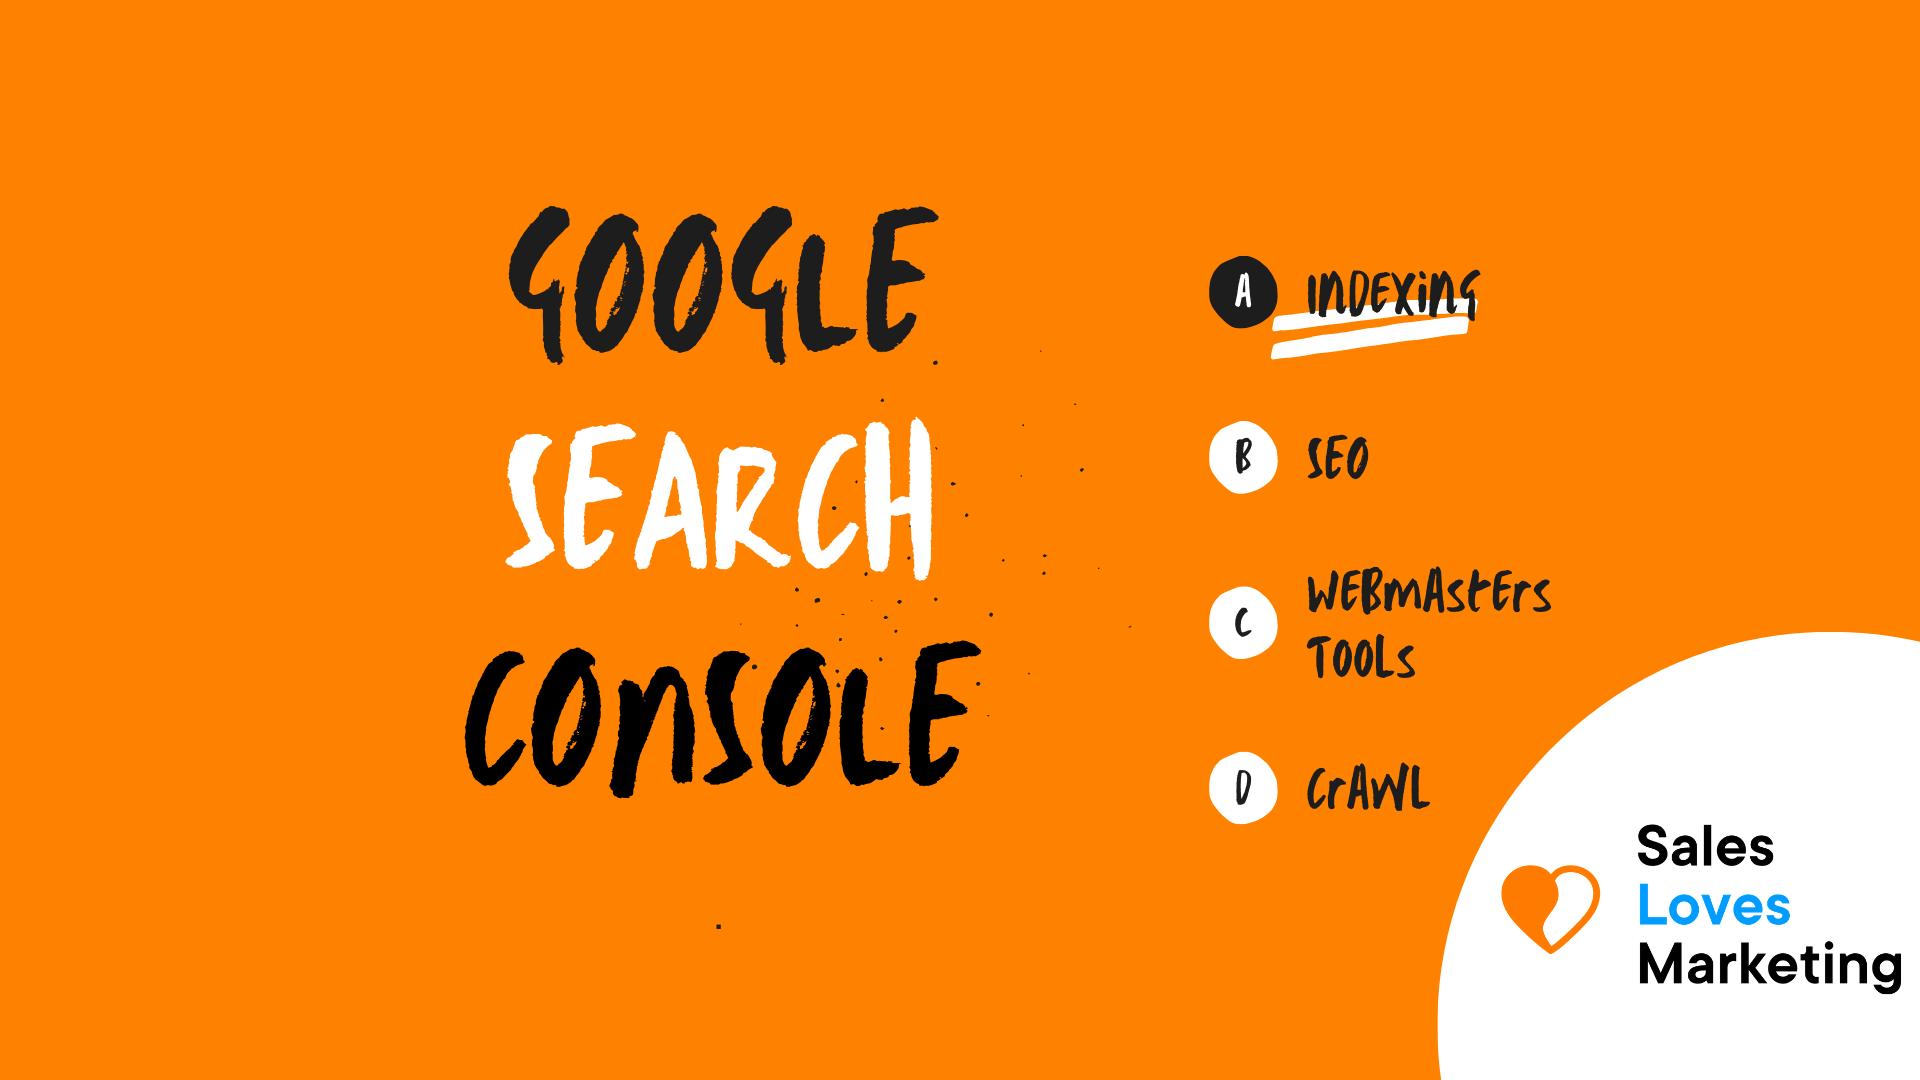 Google Search Console (GSC)